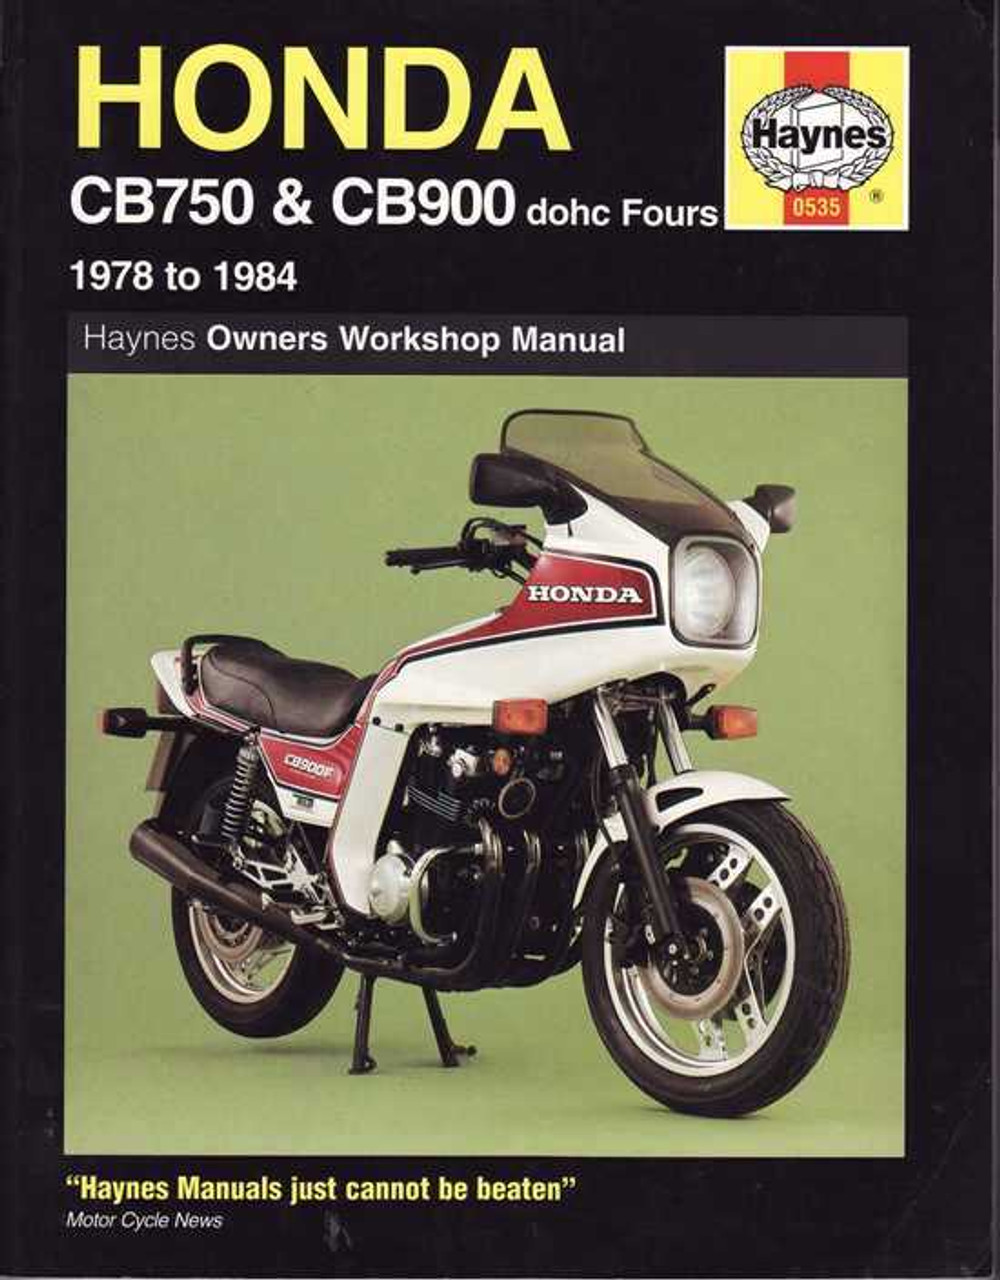 Honda cb750 amp cb900 dohc fours 1978 1984 workshop manual honda cb750 amp cb900 dohc fours 1978 1984 workshop manual publicscrutiny Gallery